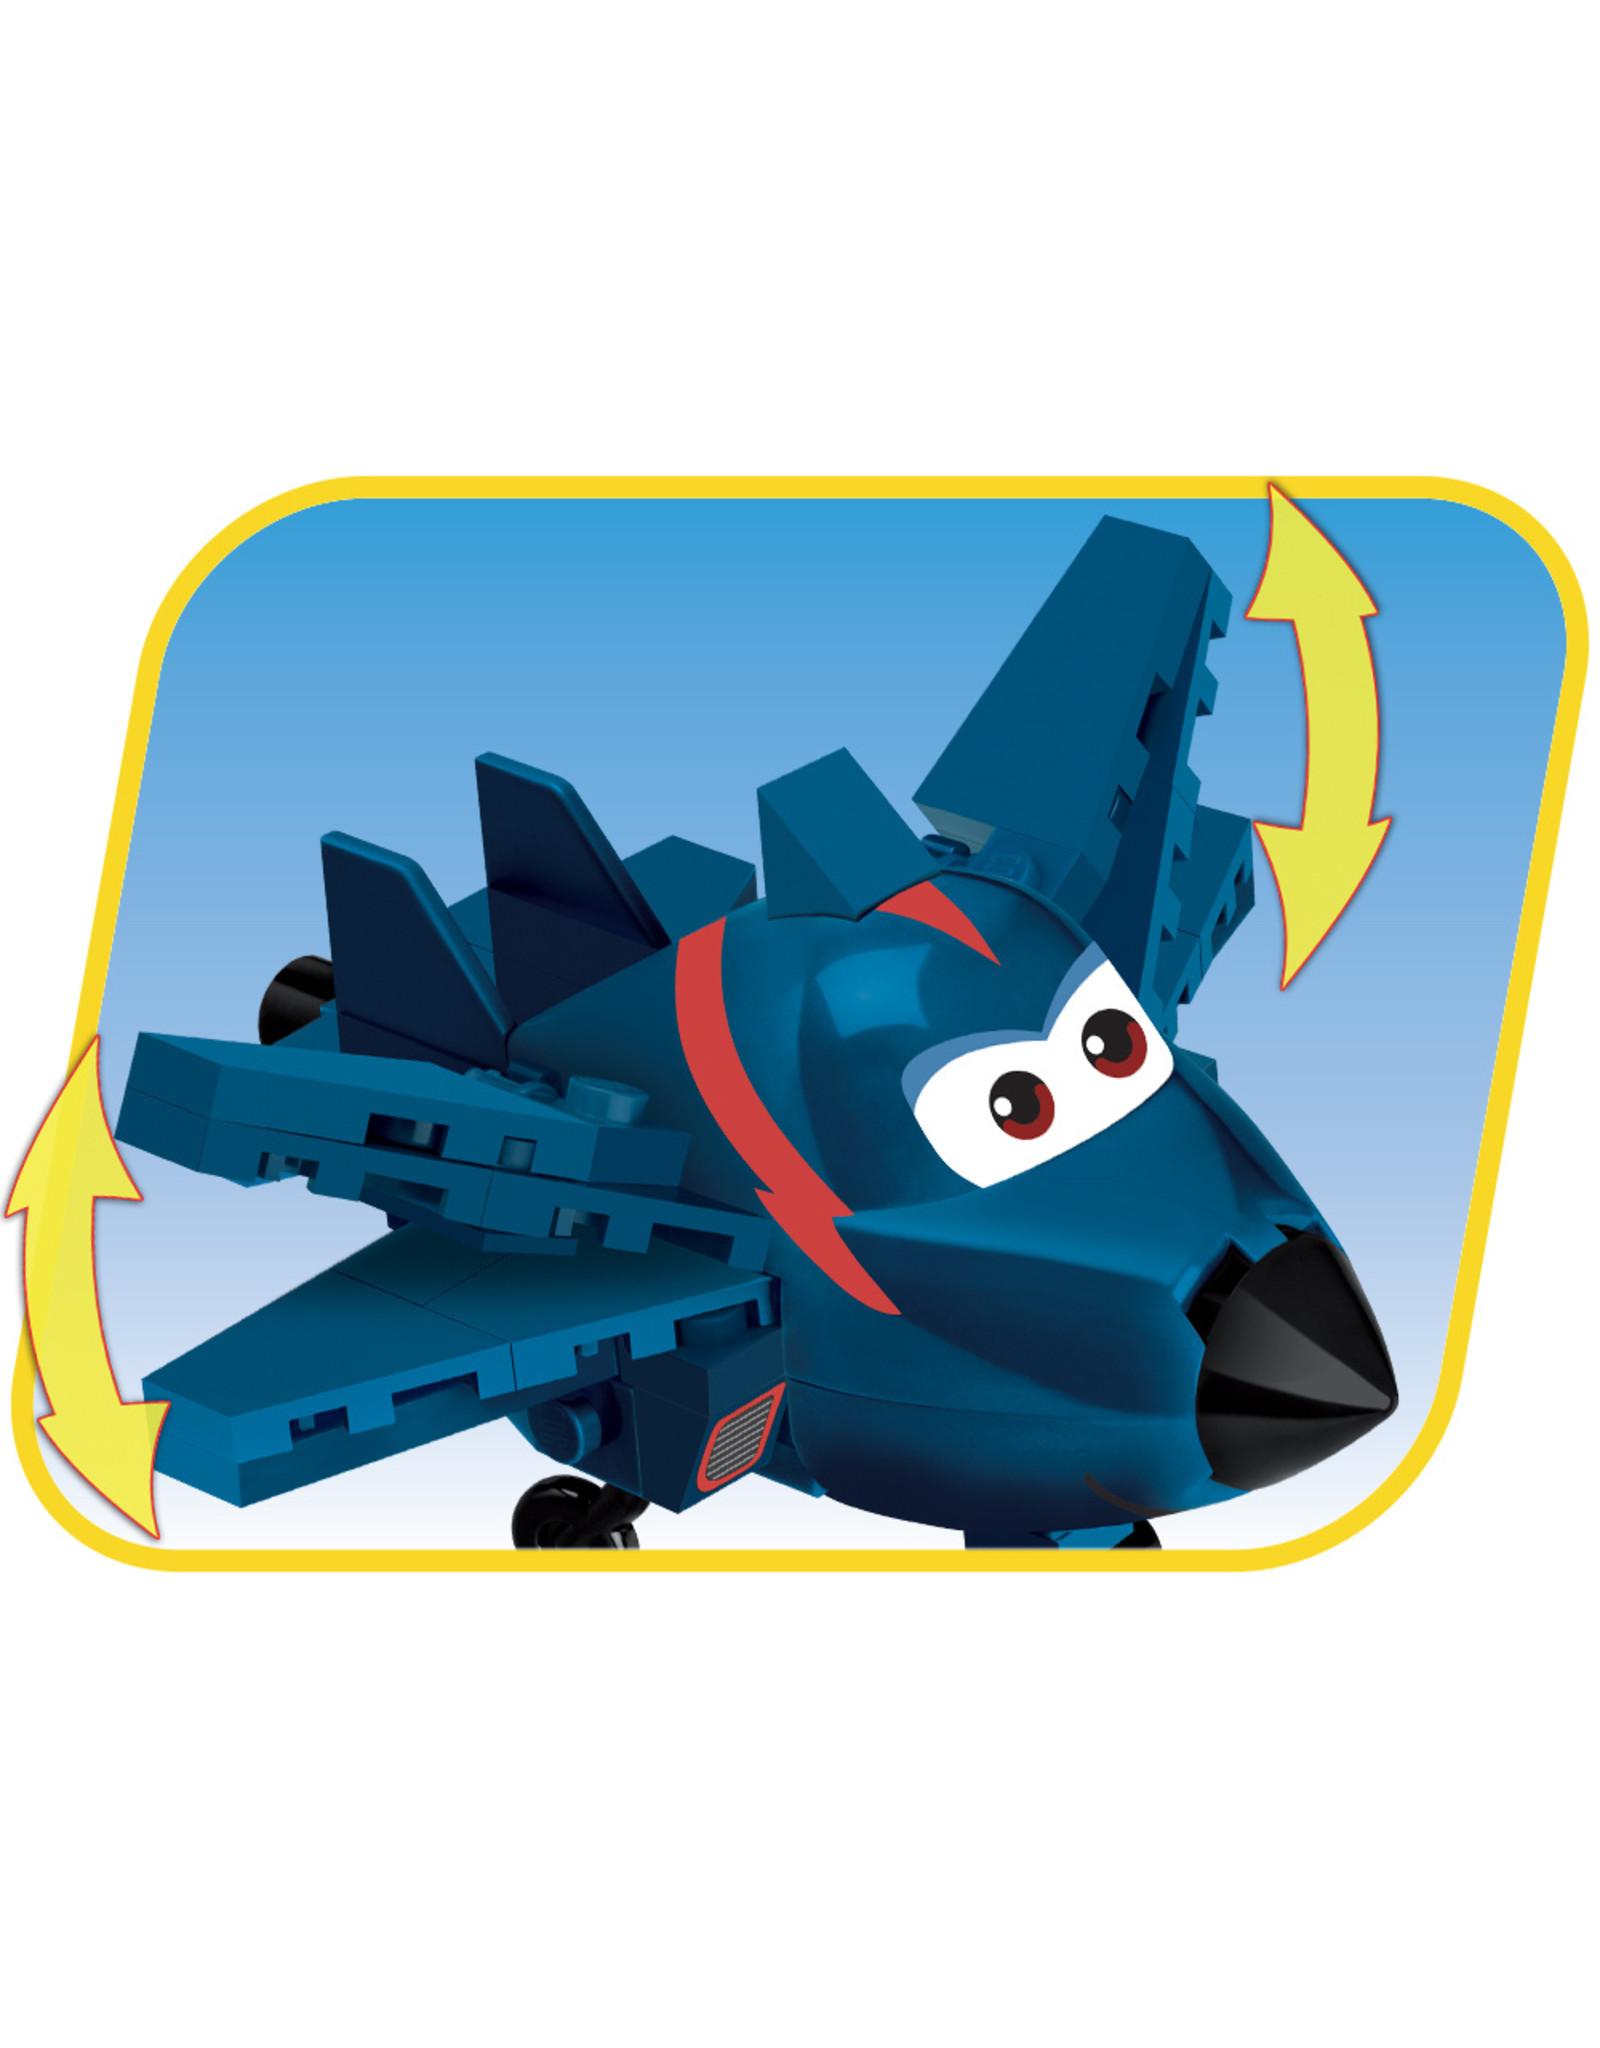 COBI Cobi  25135  Super Wings Agent Chase